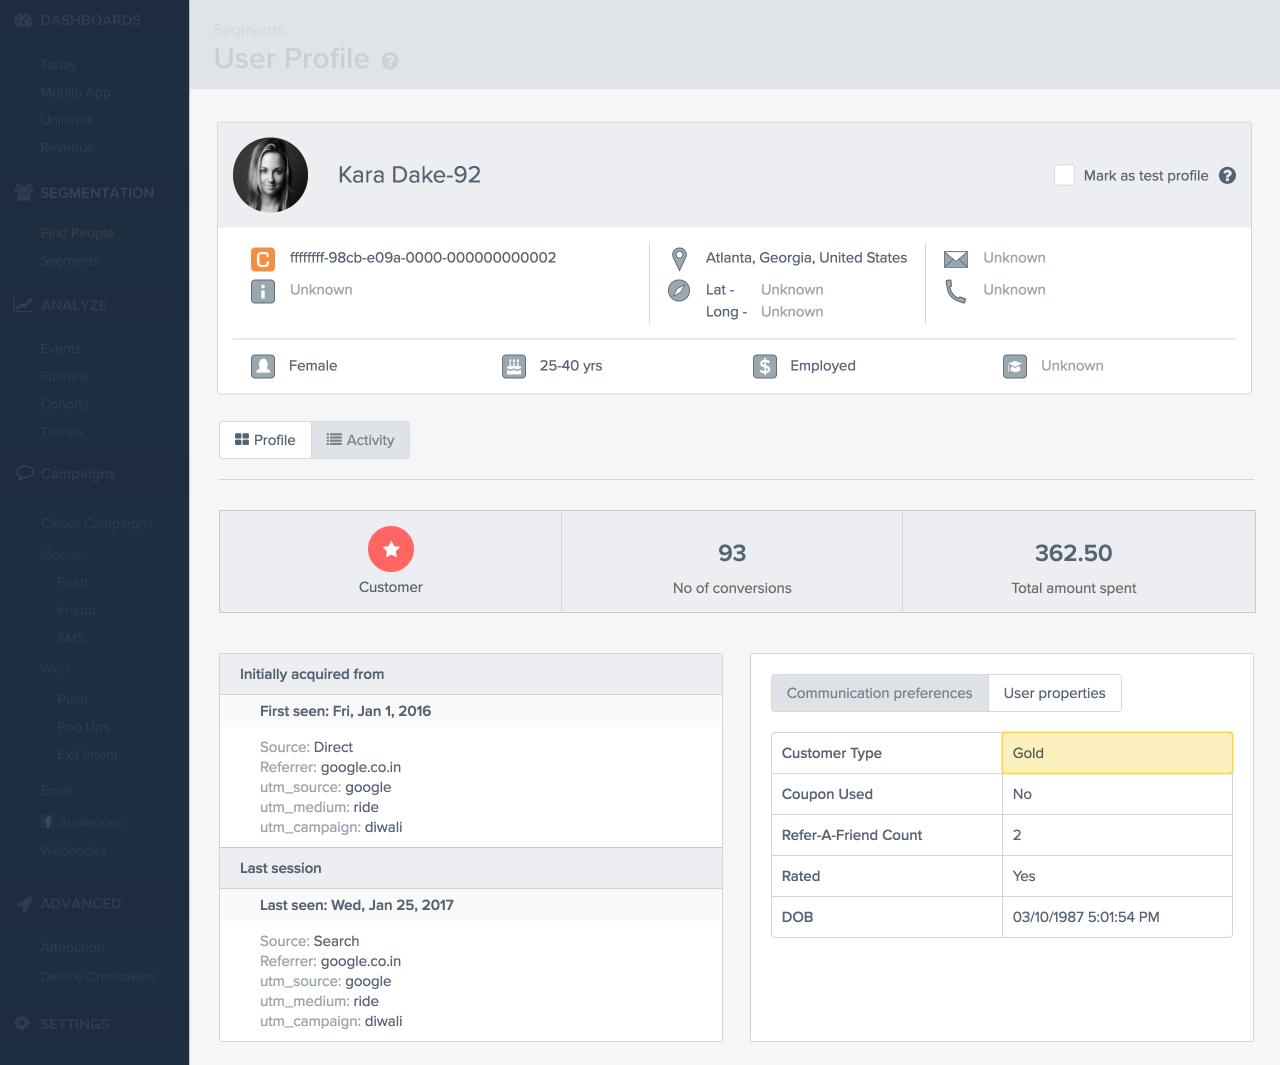 User profile properties